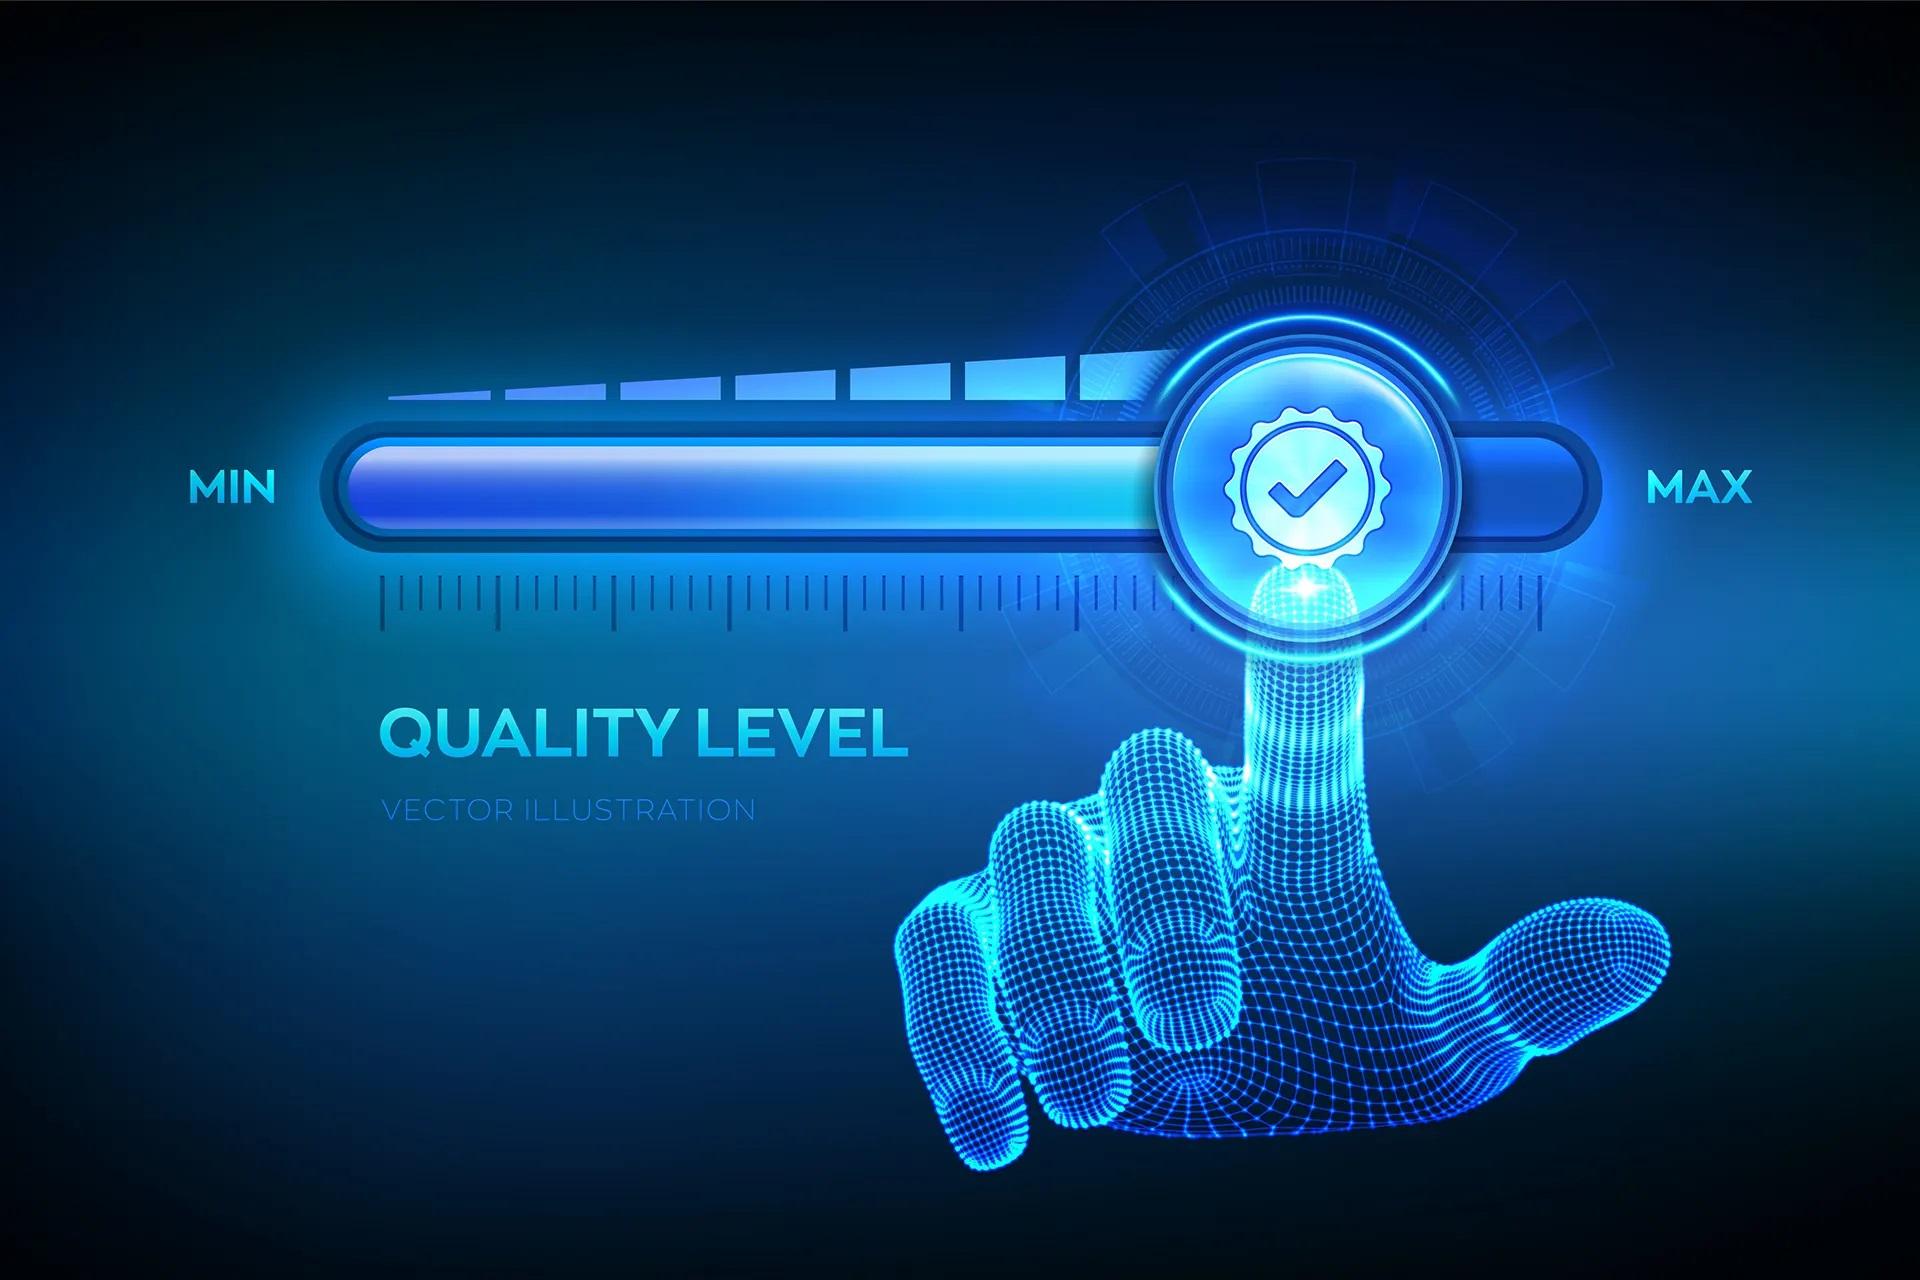 IT Insight 製造業の品質向上に役立つAI外観検査